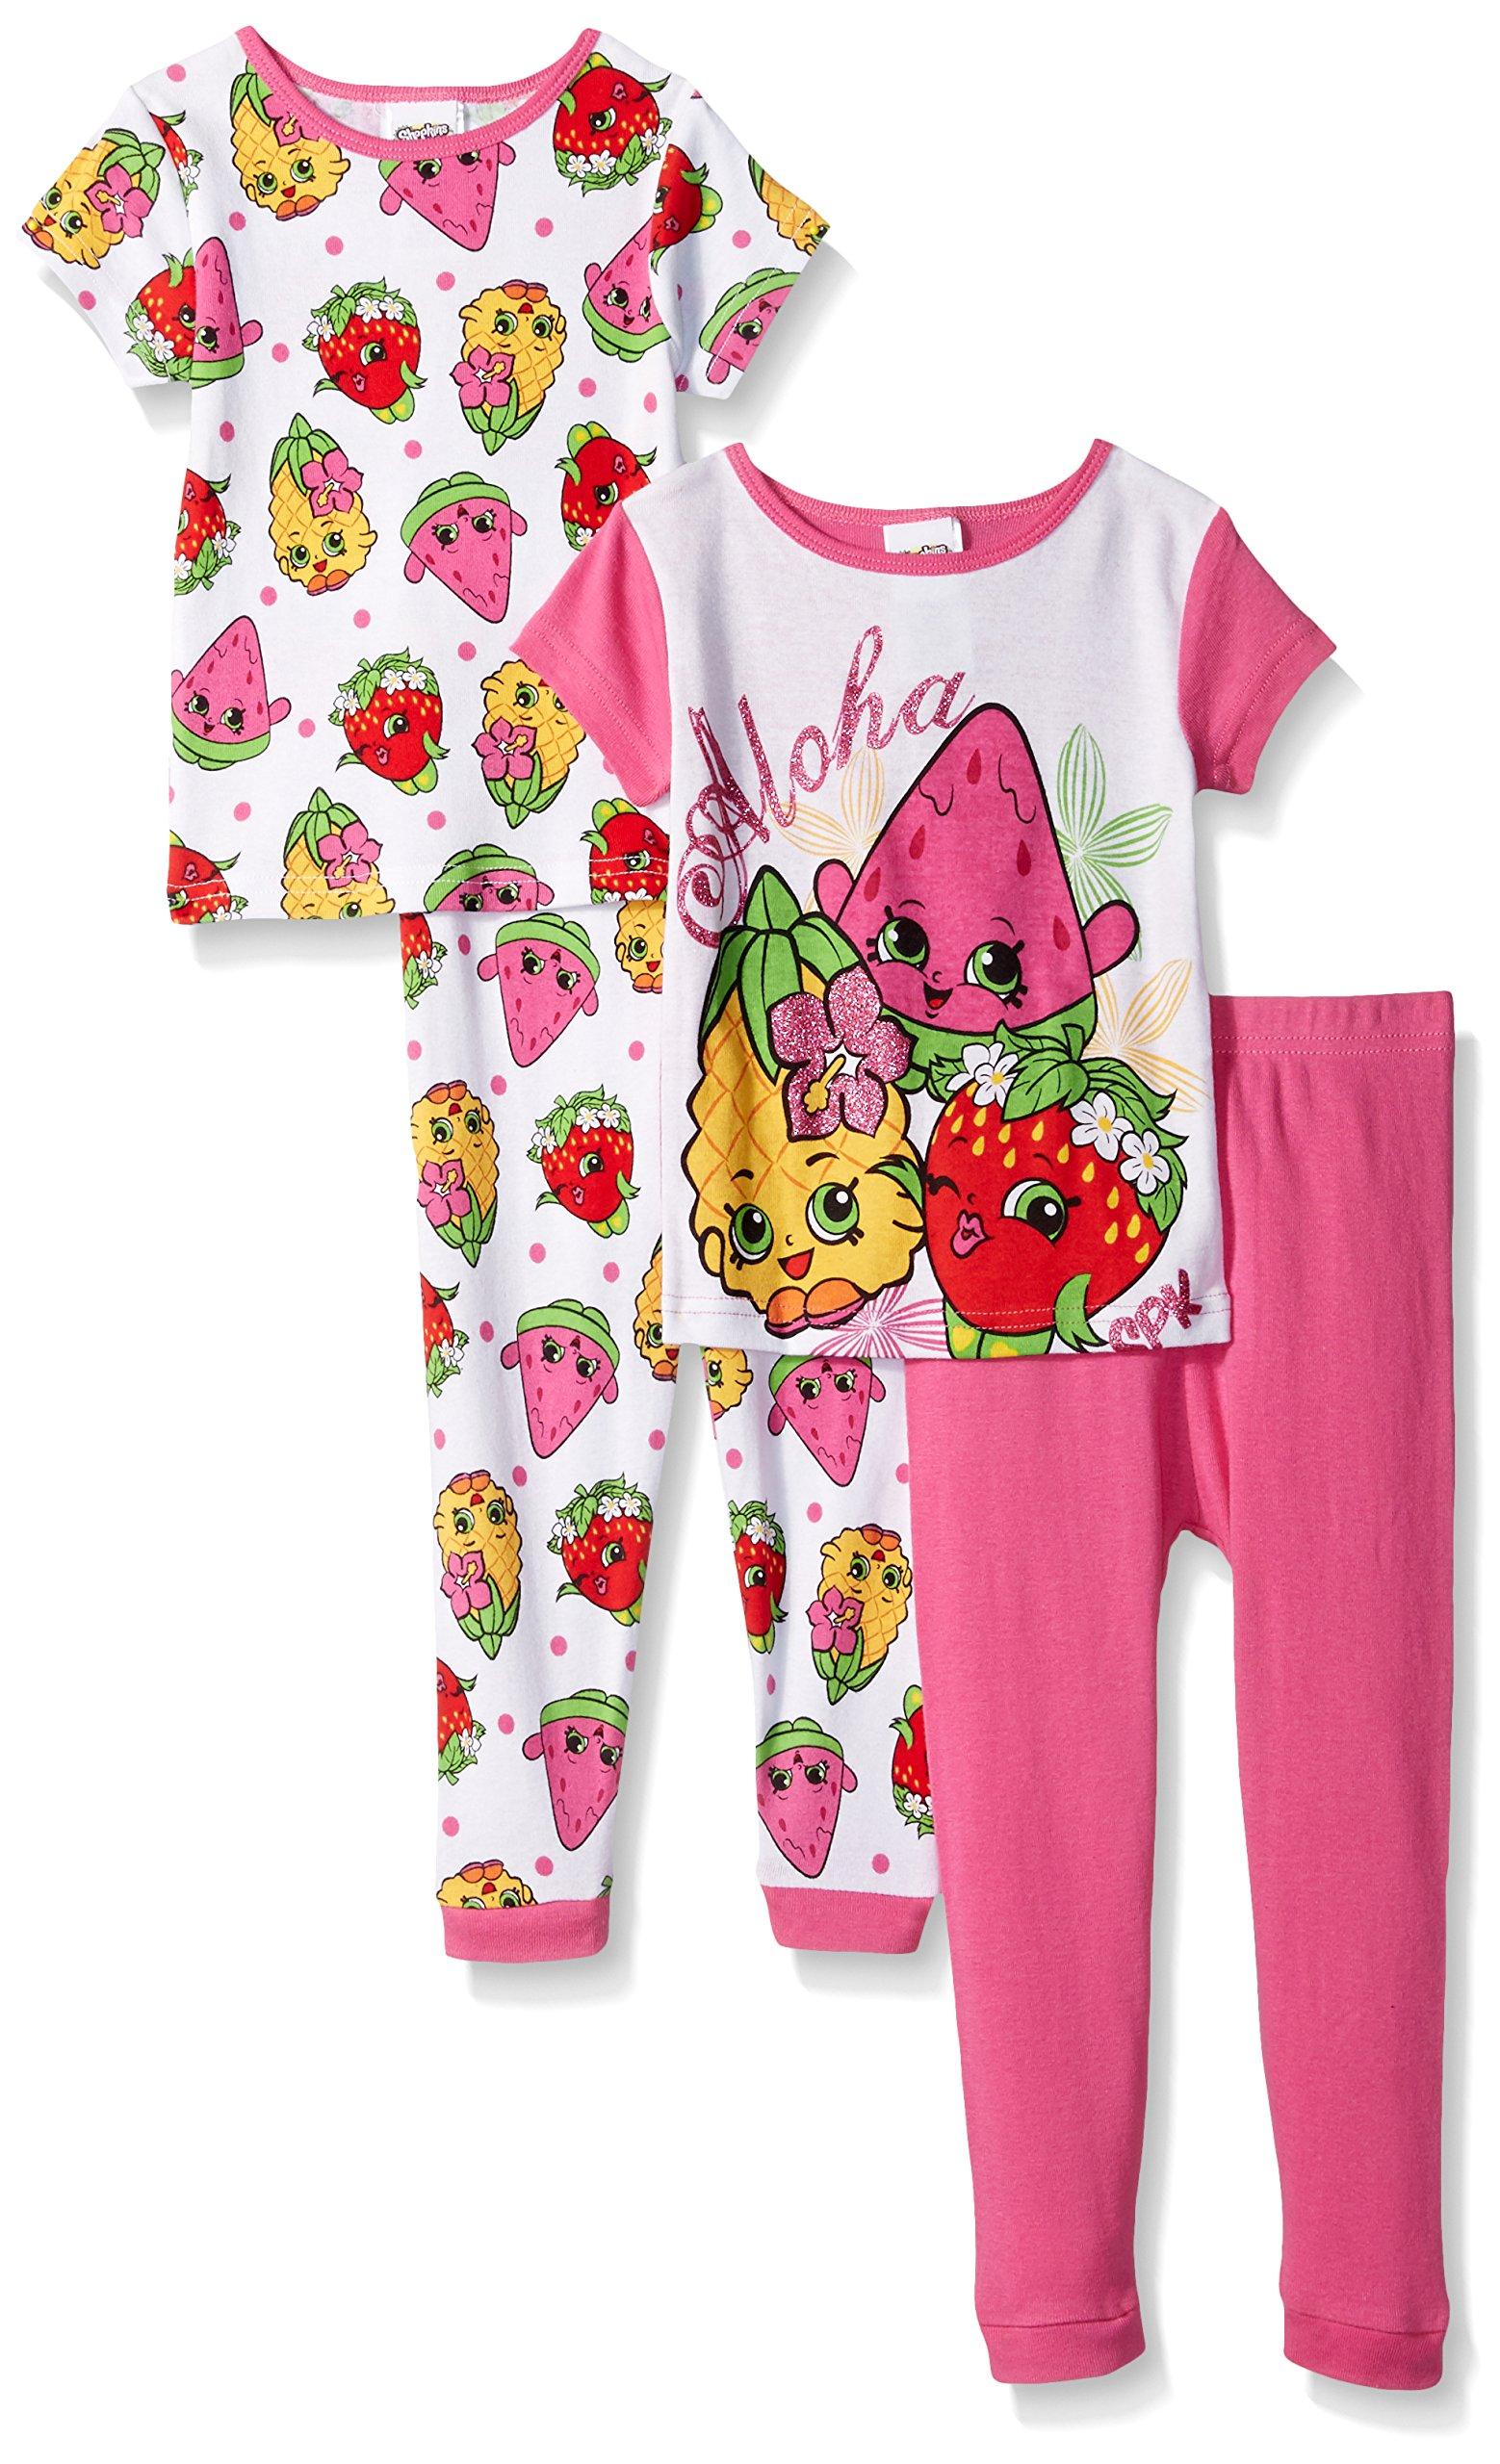 Shopkins Little Girls Keep on Shopping 4 Piece Cotton Pajamas Set, 10